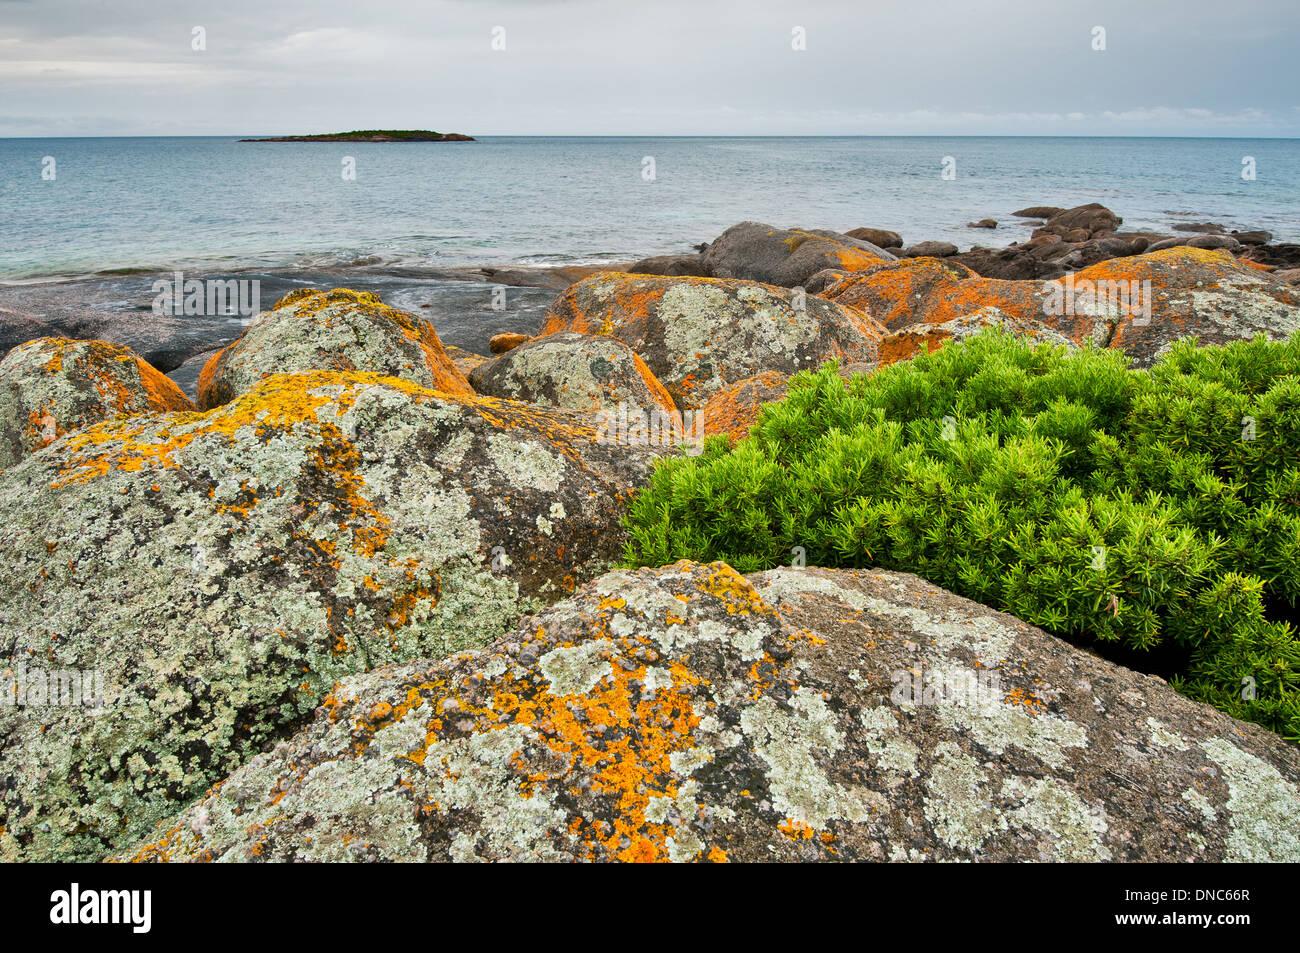 Lichen-covered rocks at Cape Donington. - Stock Image